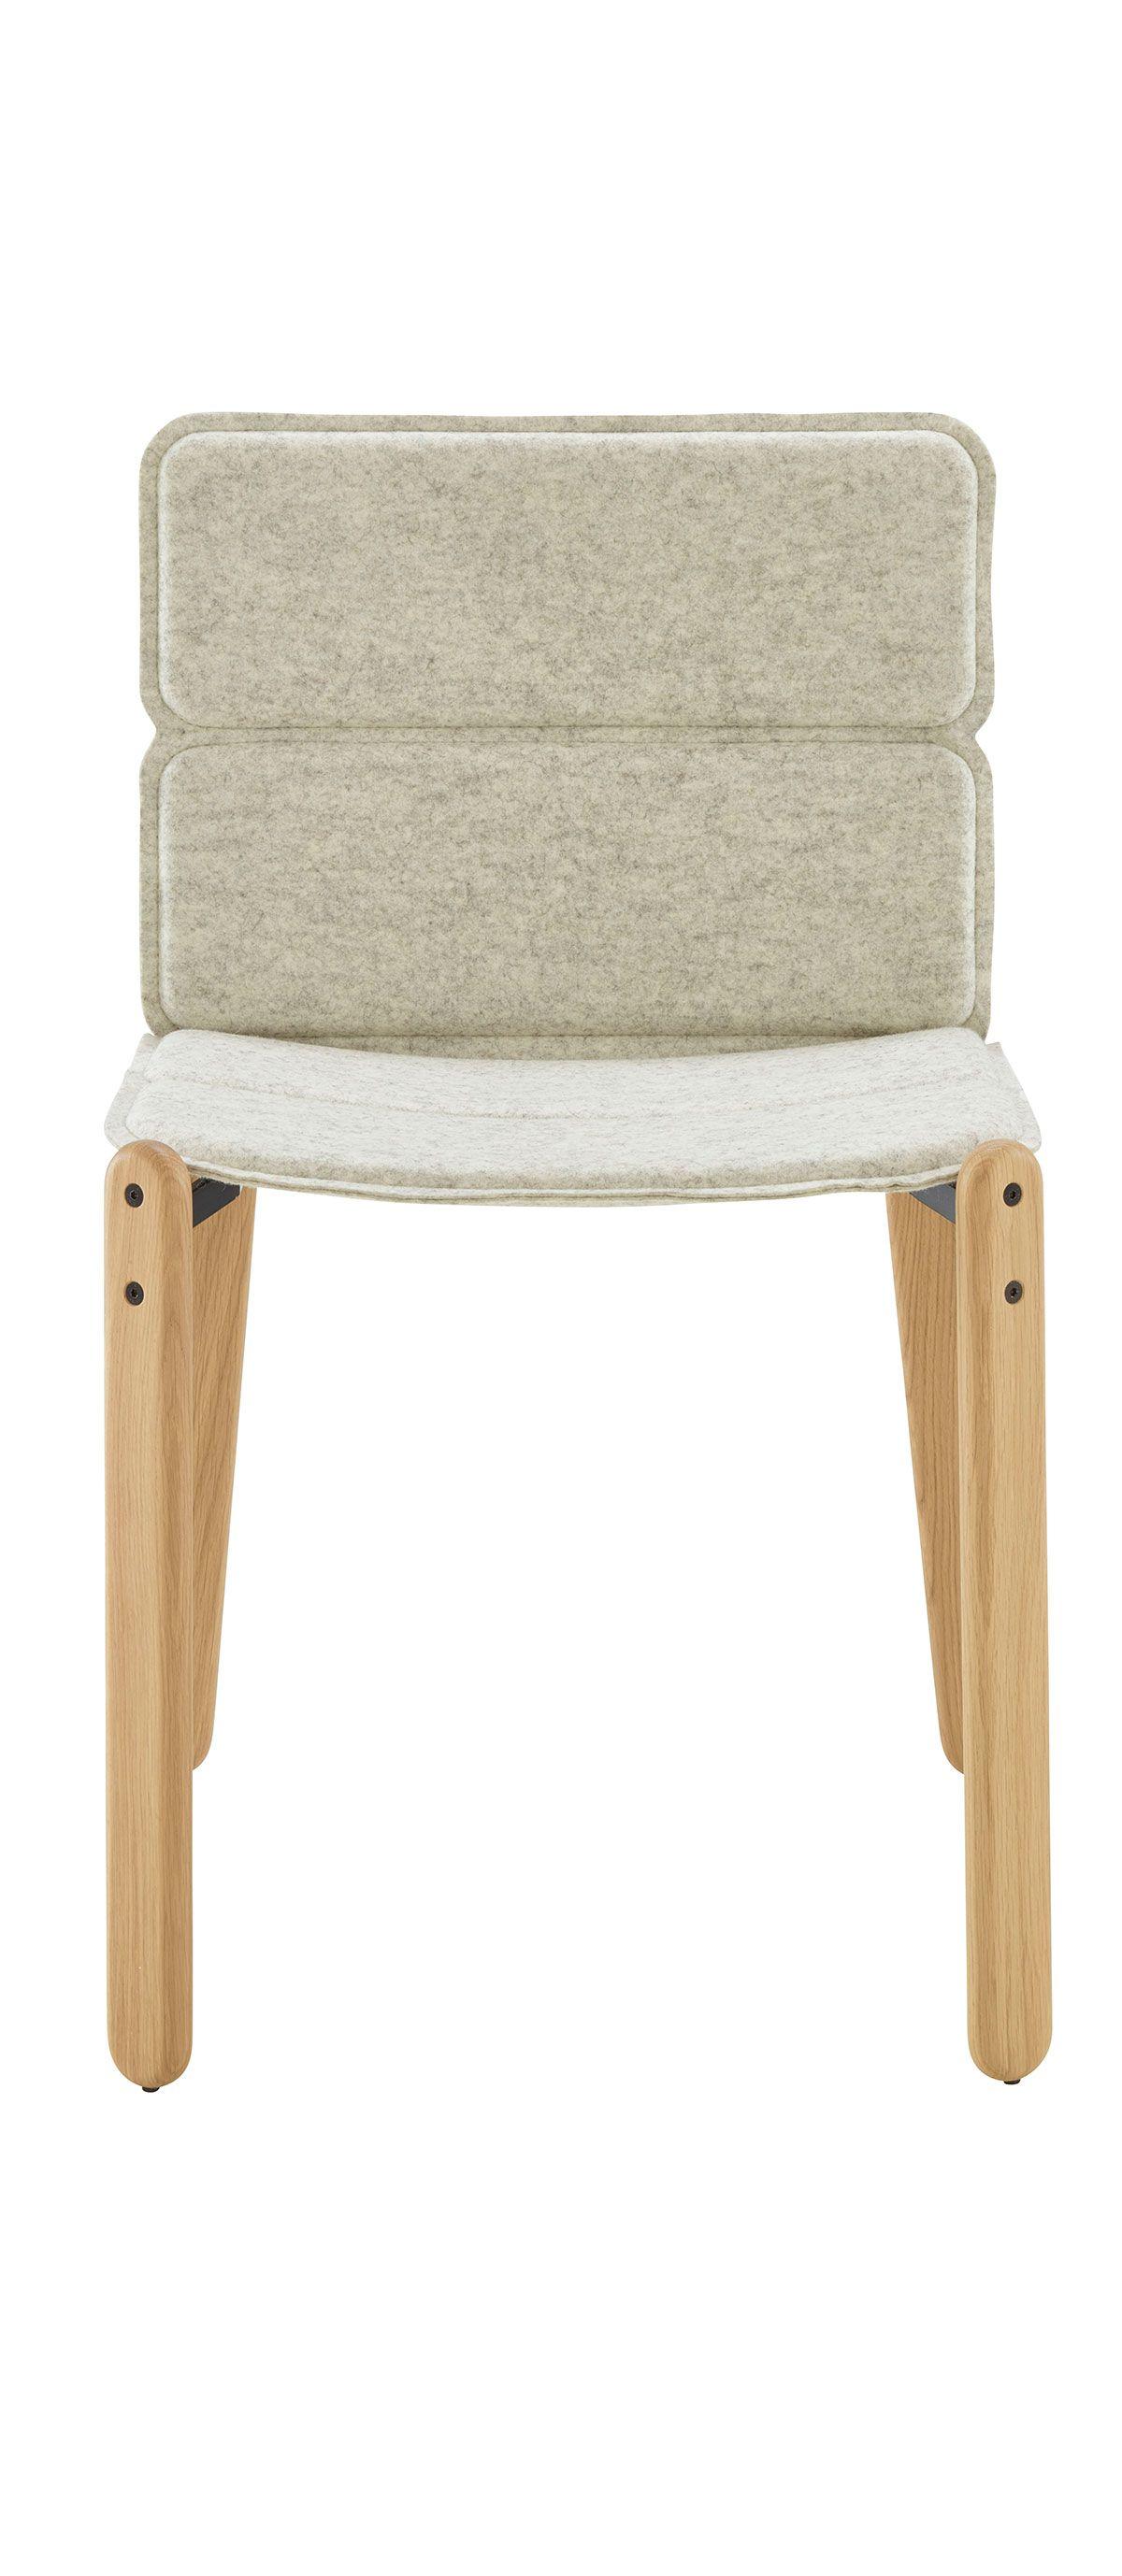 Paddock Dining Chair Designed By Desormeaux Et Carrette For Ligne